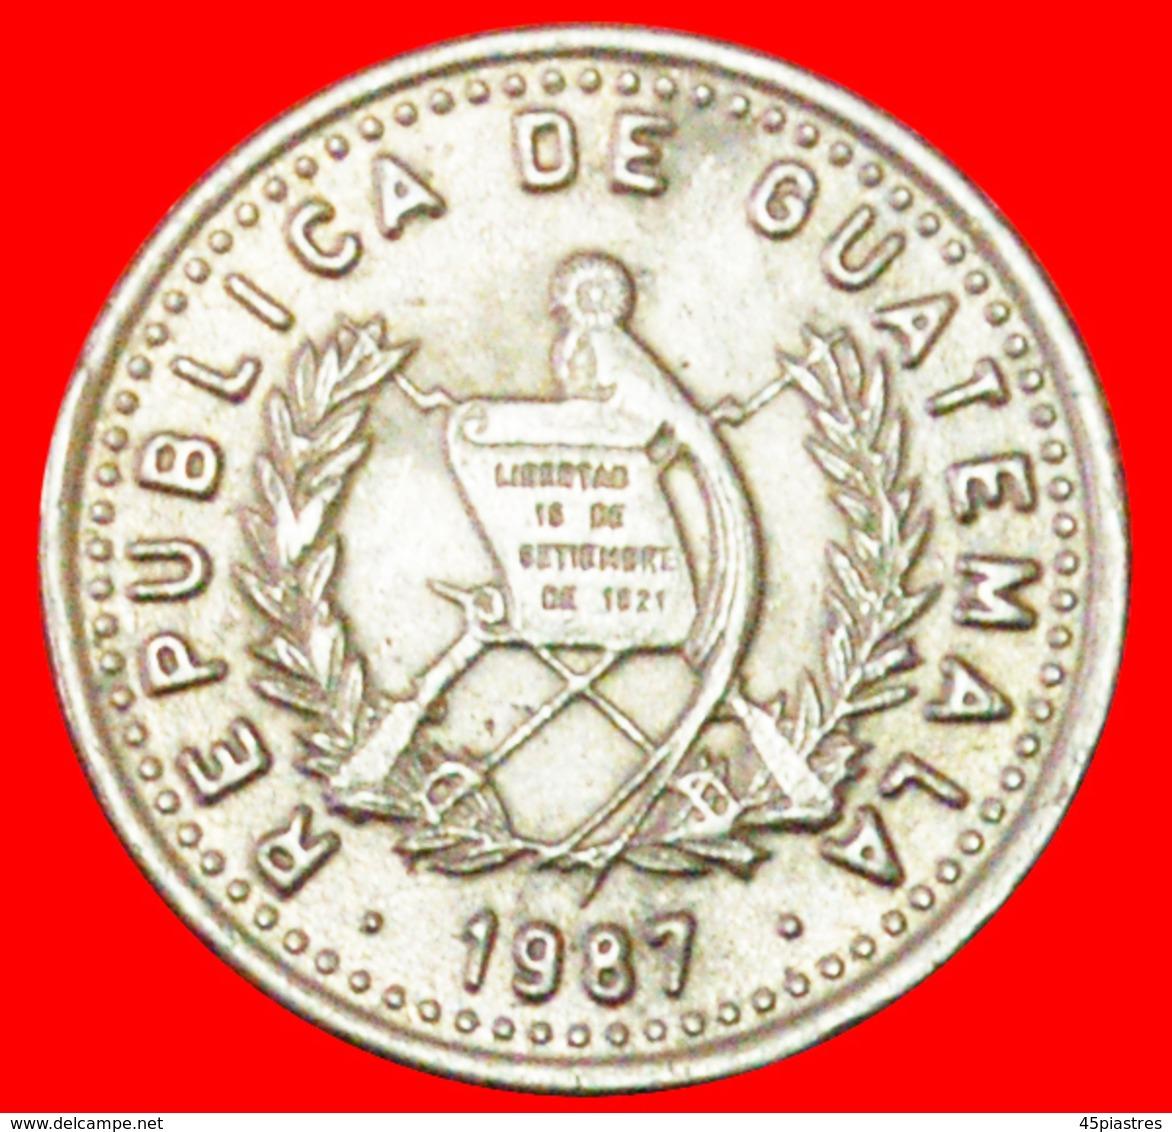 # BIRD (1977-2010): GUATEMALA ★ 5 CENTAVOS 1987! LOW START ★ NO RESERVE! - Guatemala